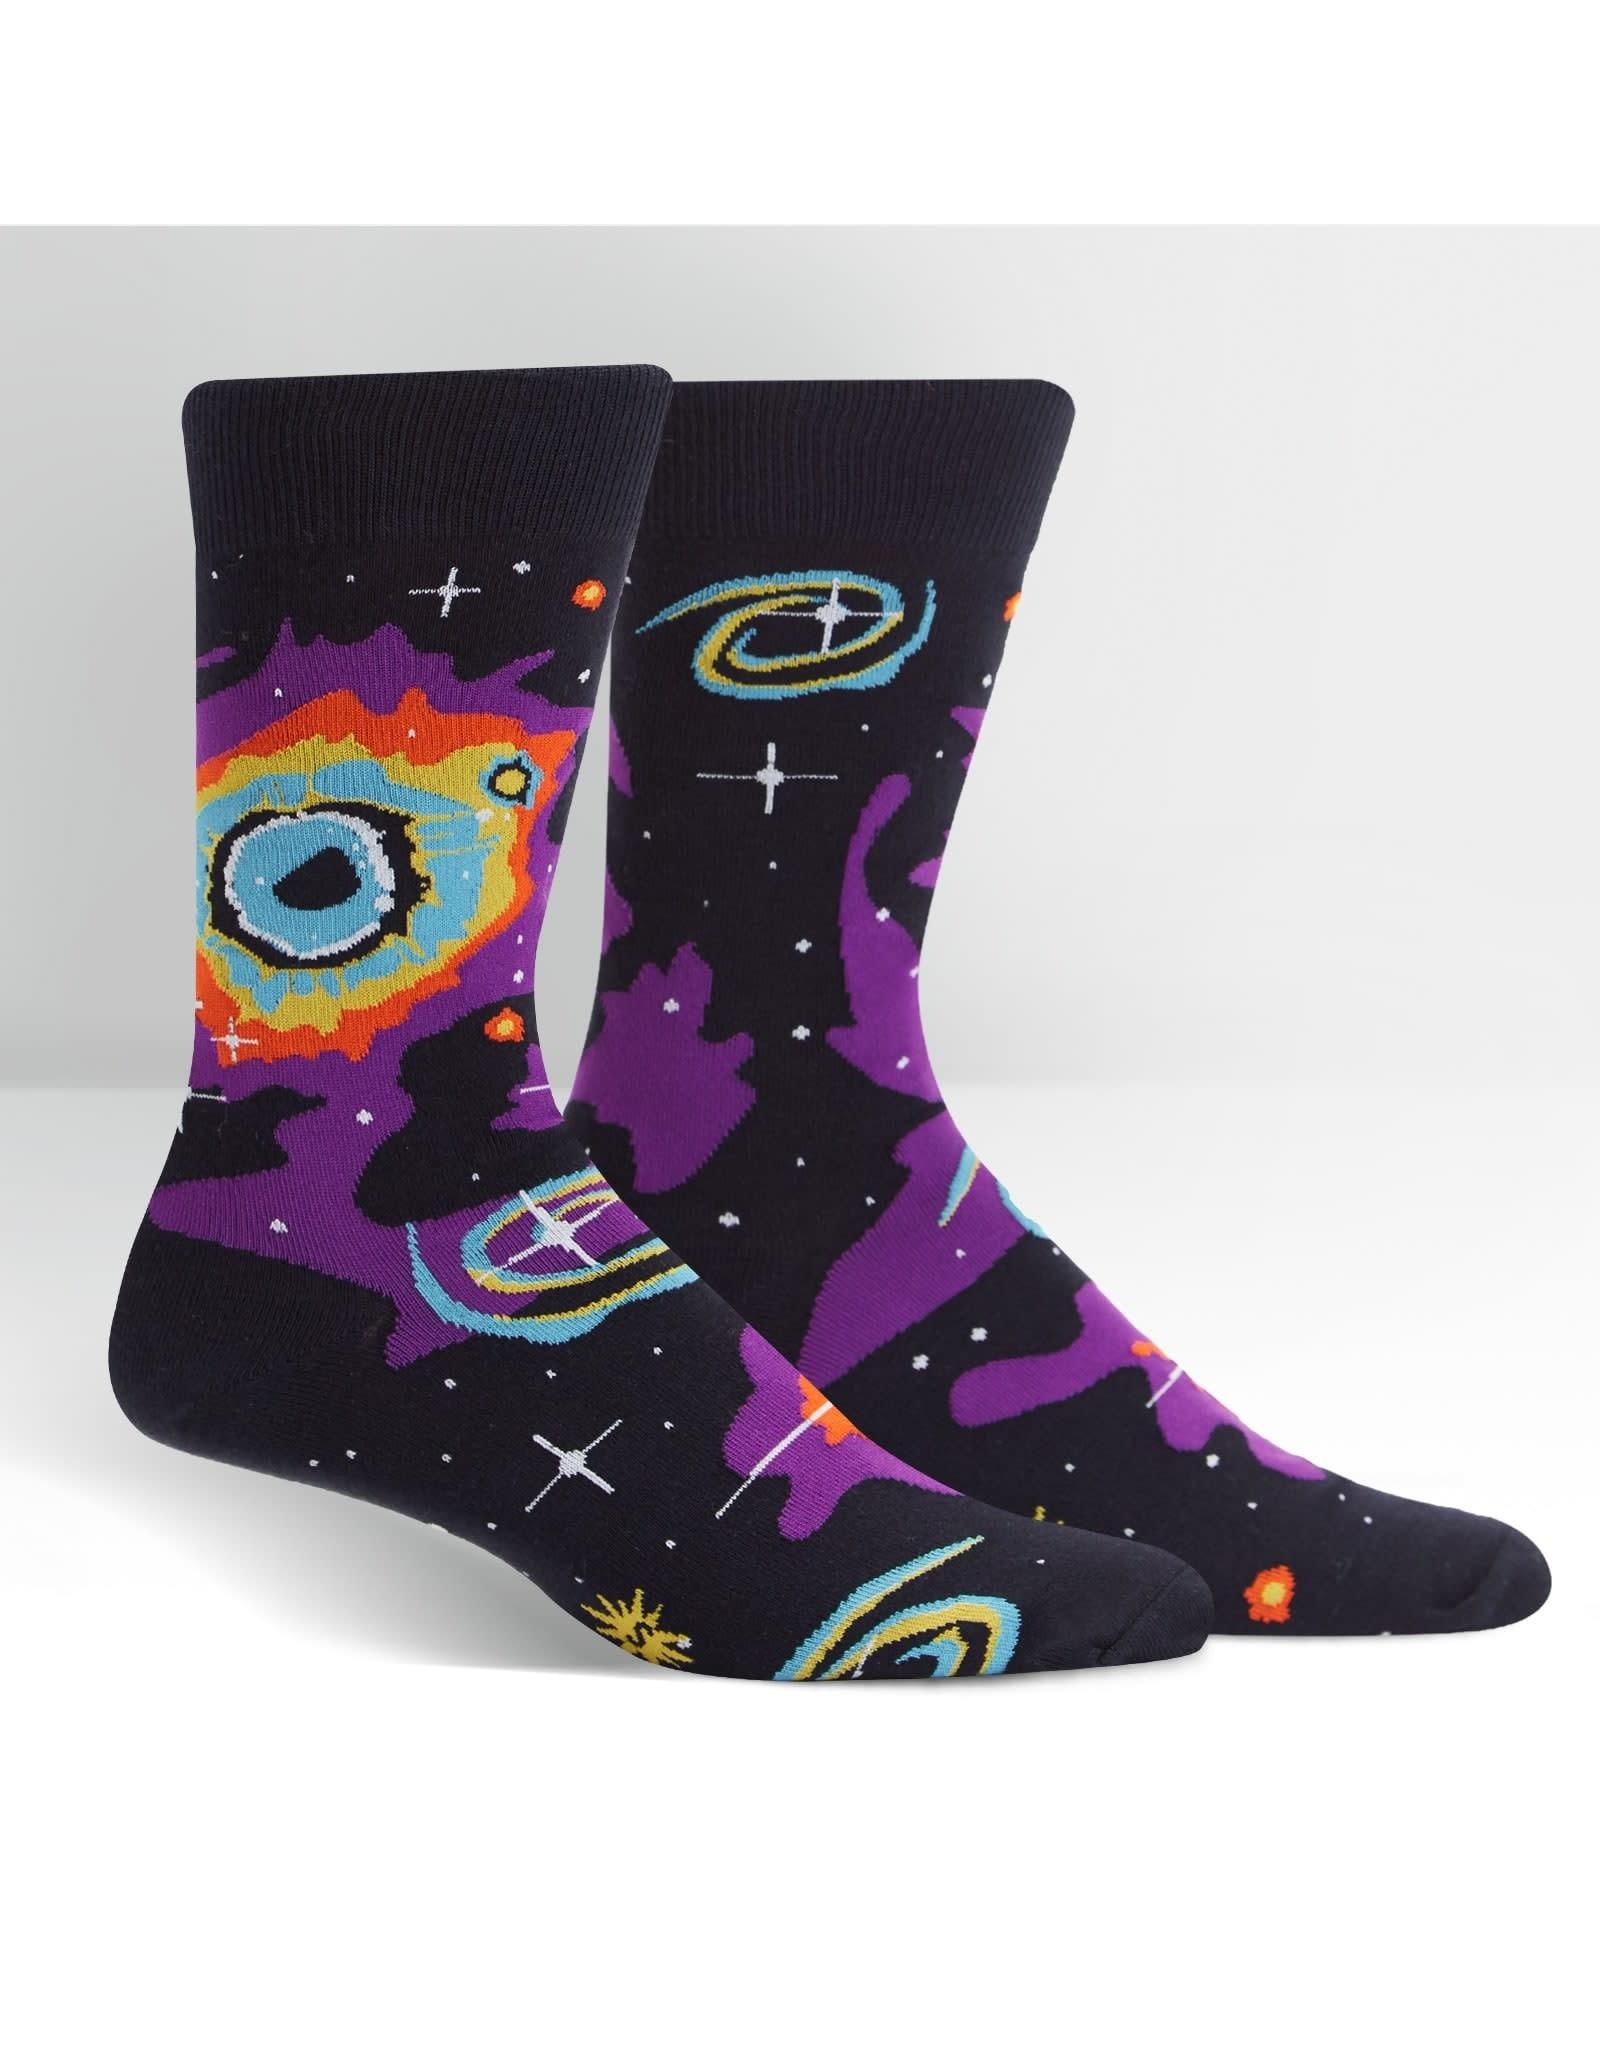 SOCK IT TO ME - Men's Helix Nebula Crew Socks